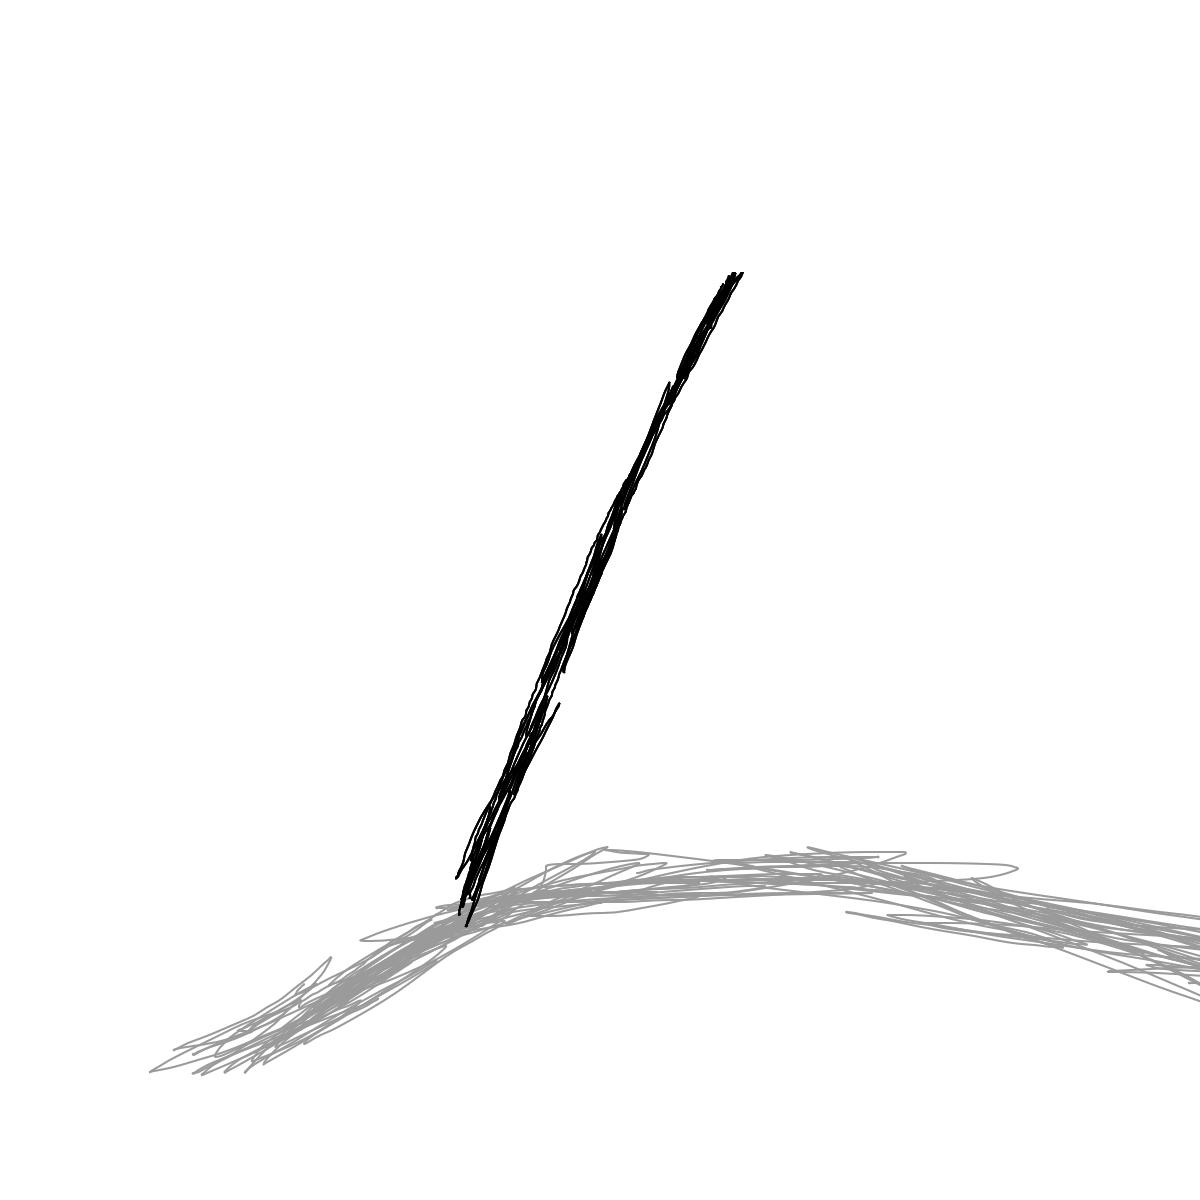 BAAAM drawing#764 lat:44.3511466979980500lng: -4.6808404922485350